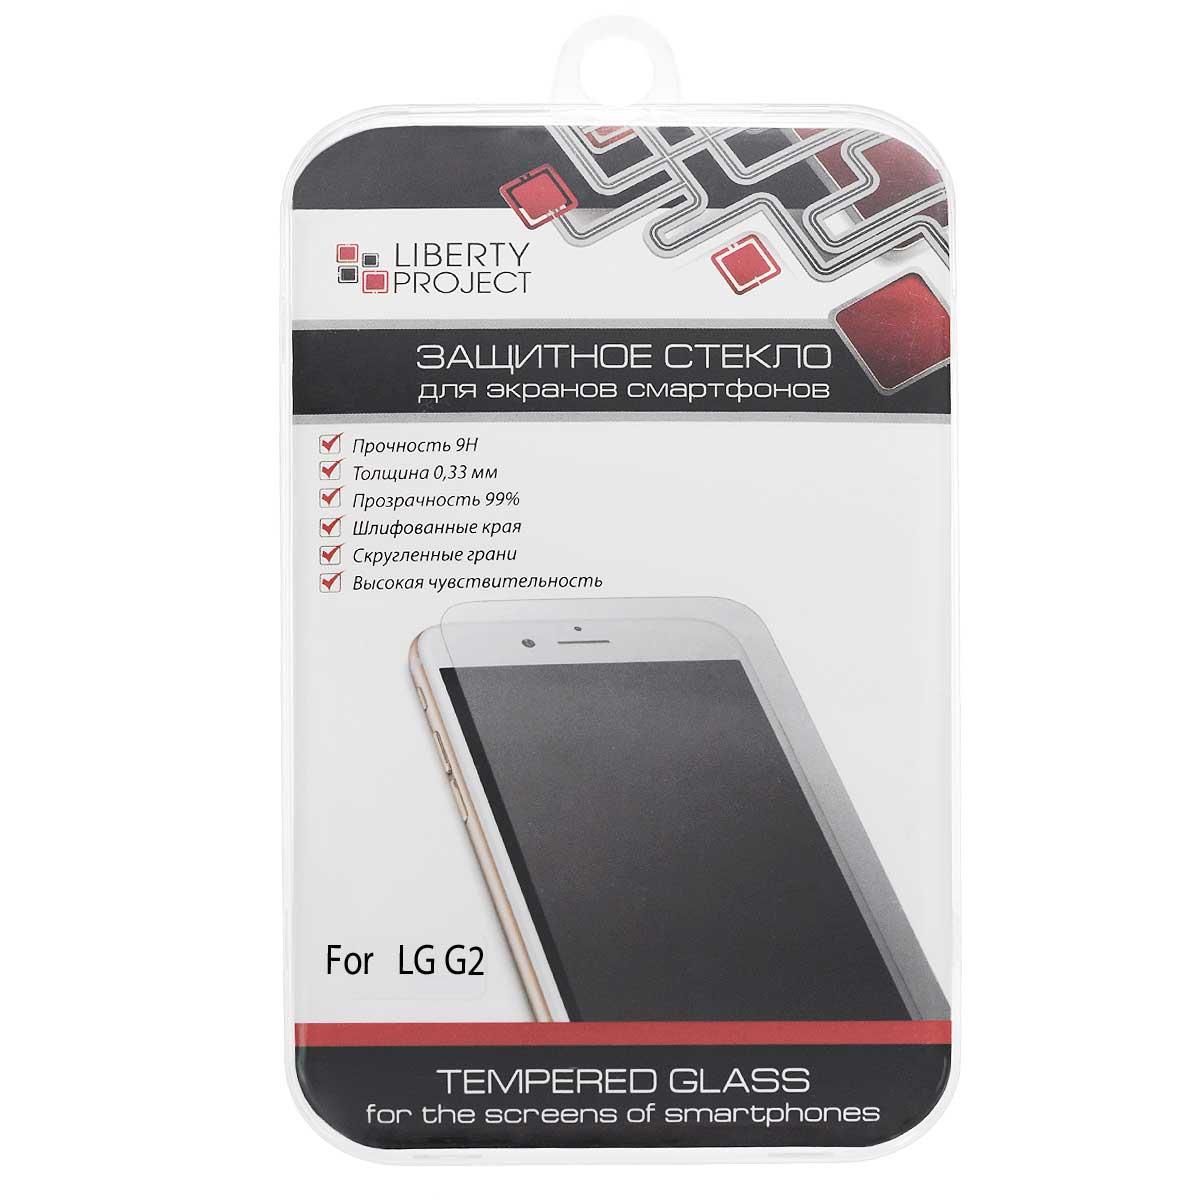 Liberty Project Tempered Glass защитное стекло для LG G2, Clear (0,33 мм) защитные стекла liberty project защитное стекло lp для nokia 532 tempered glass 0 33 мм 9h ударопрочное конверт